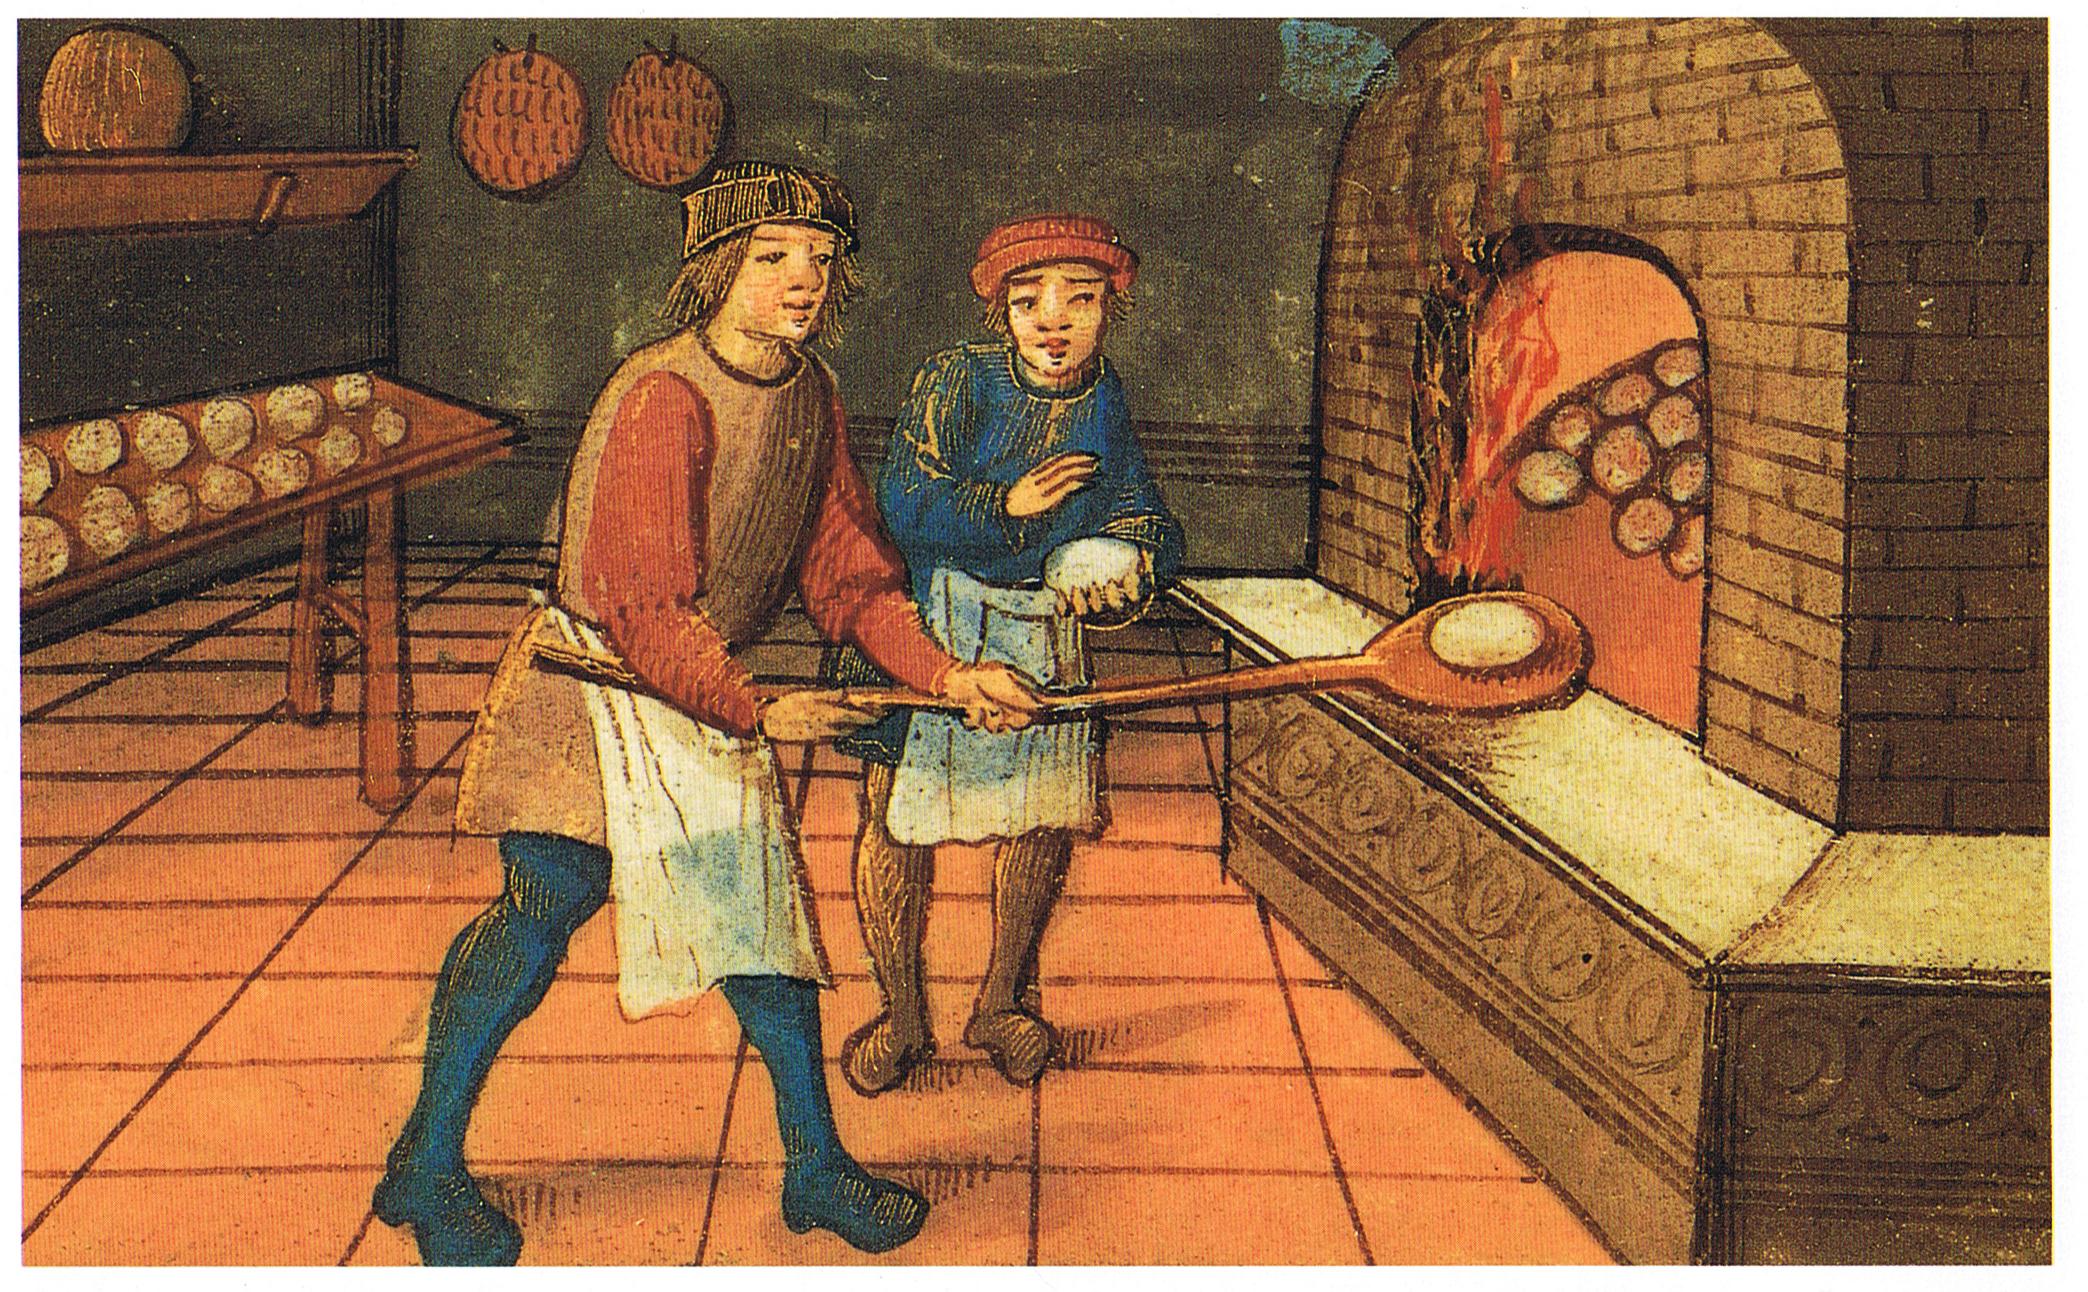 Depiction of Aprendiz